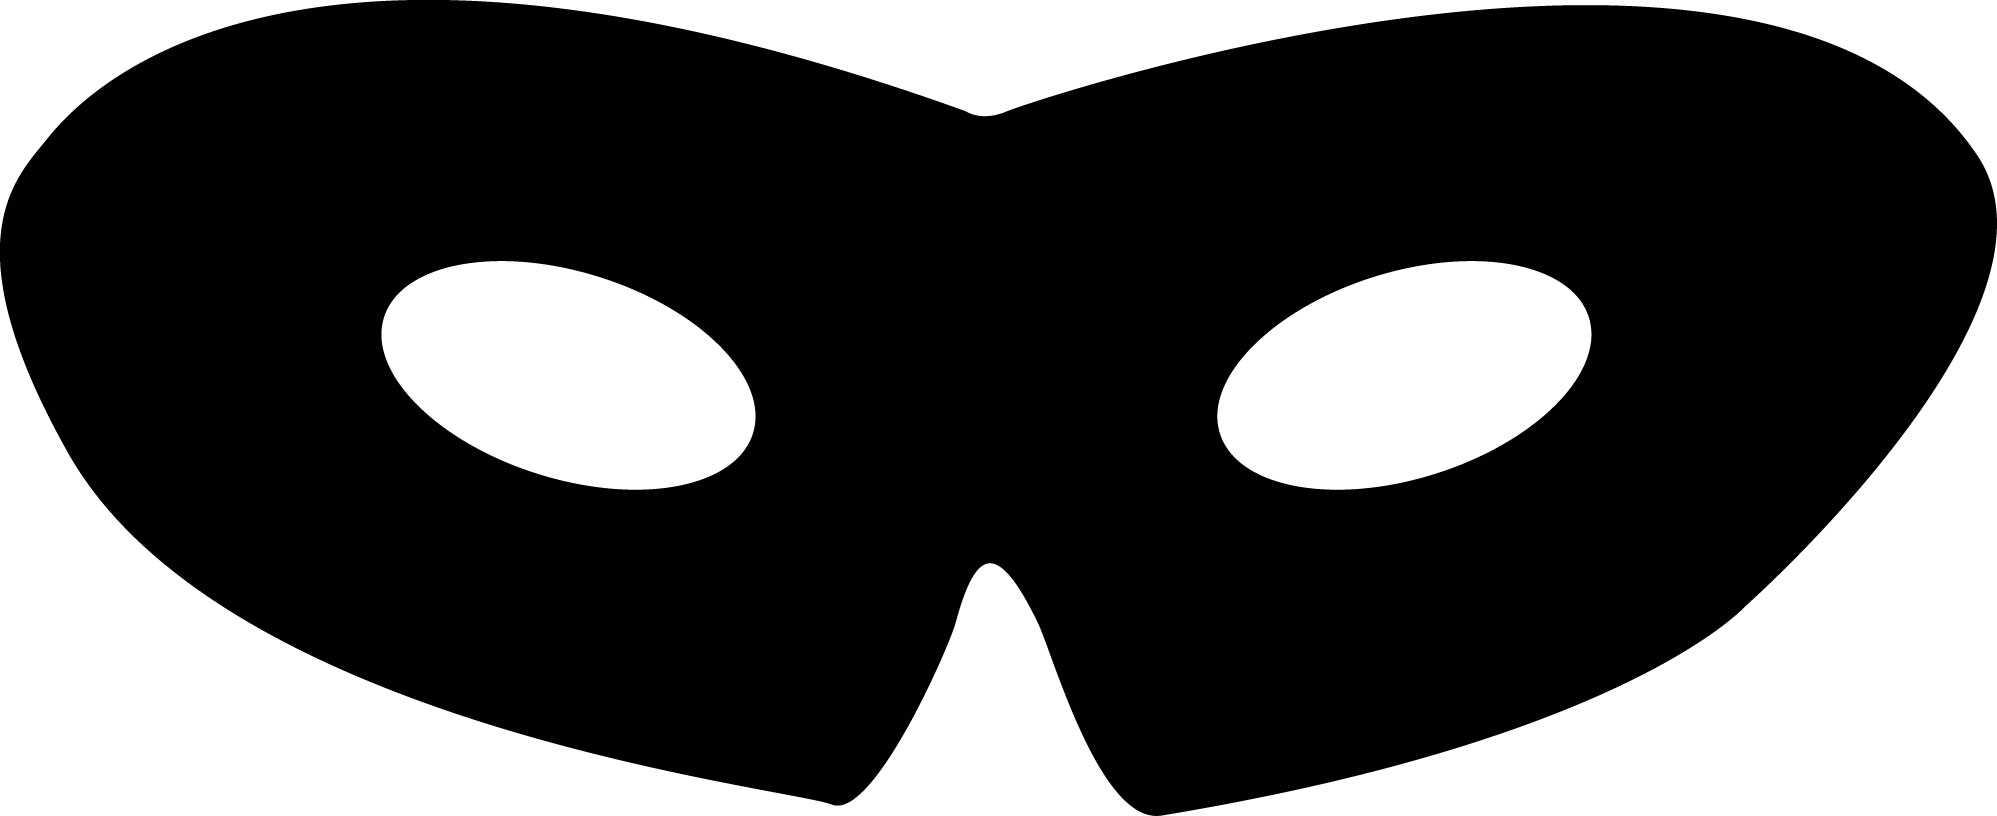 1997x816 Masks Clipart Simple